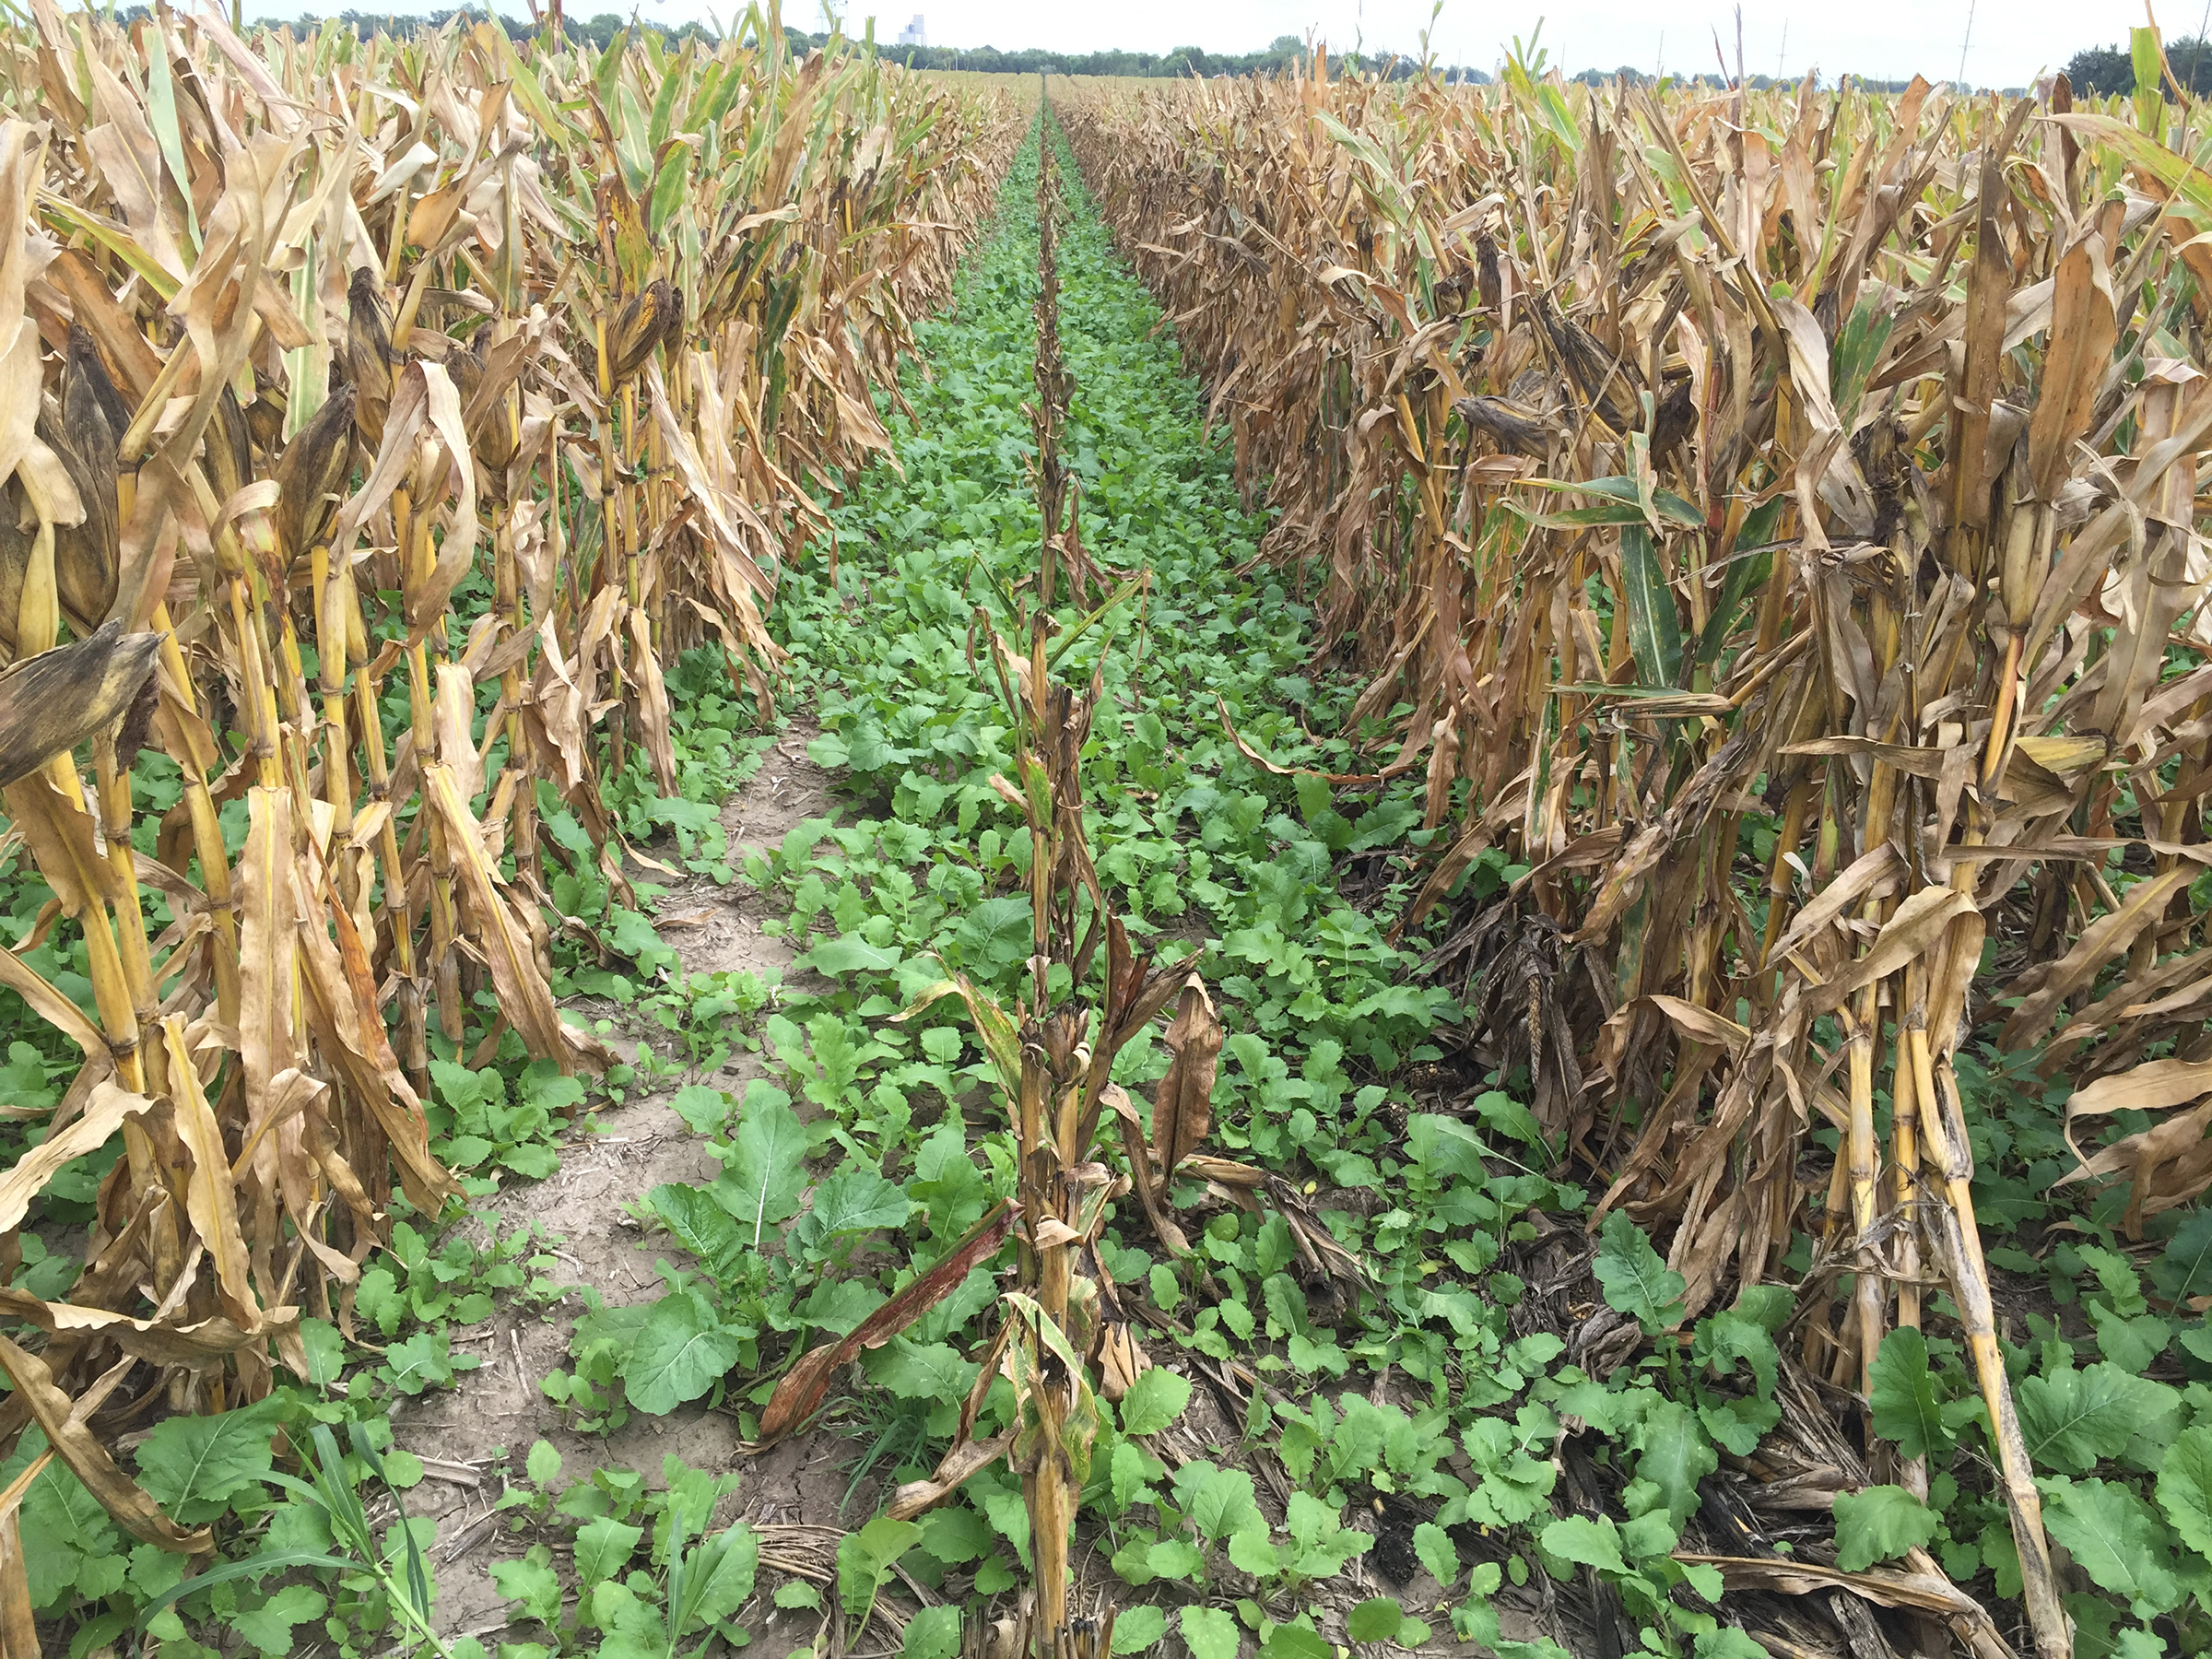 Nebraska Farmers Share Cover Crop Why's and How's | CropWatch | University of Nebraska–Lincoln